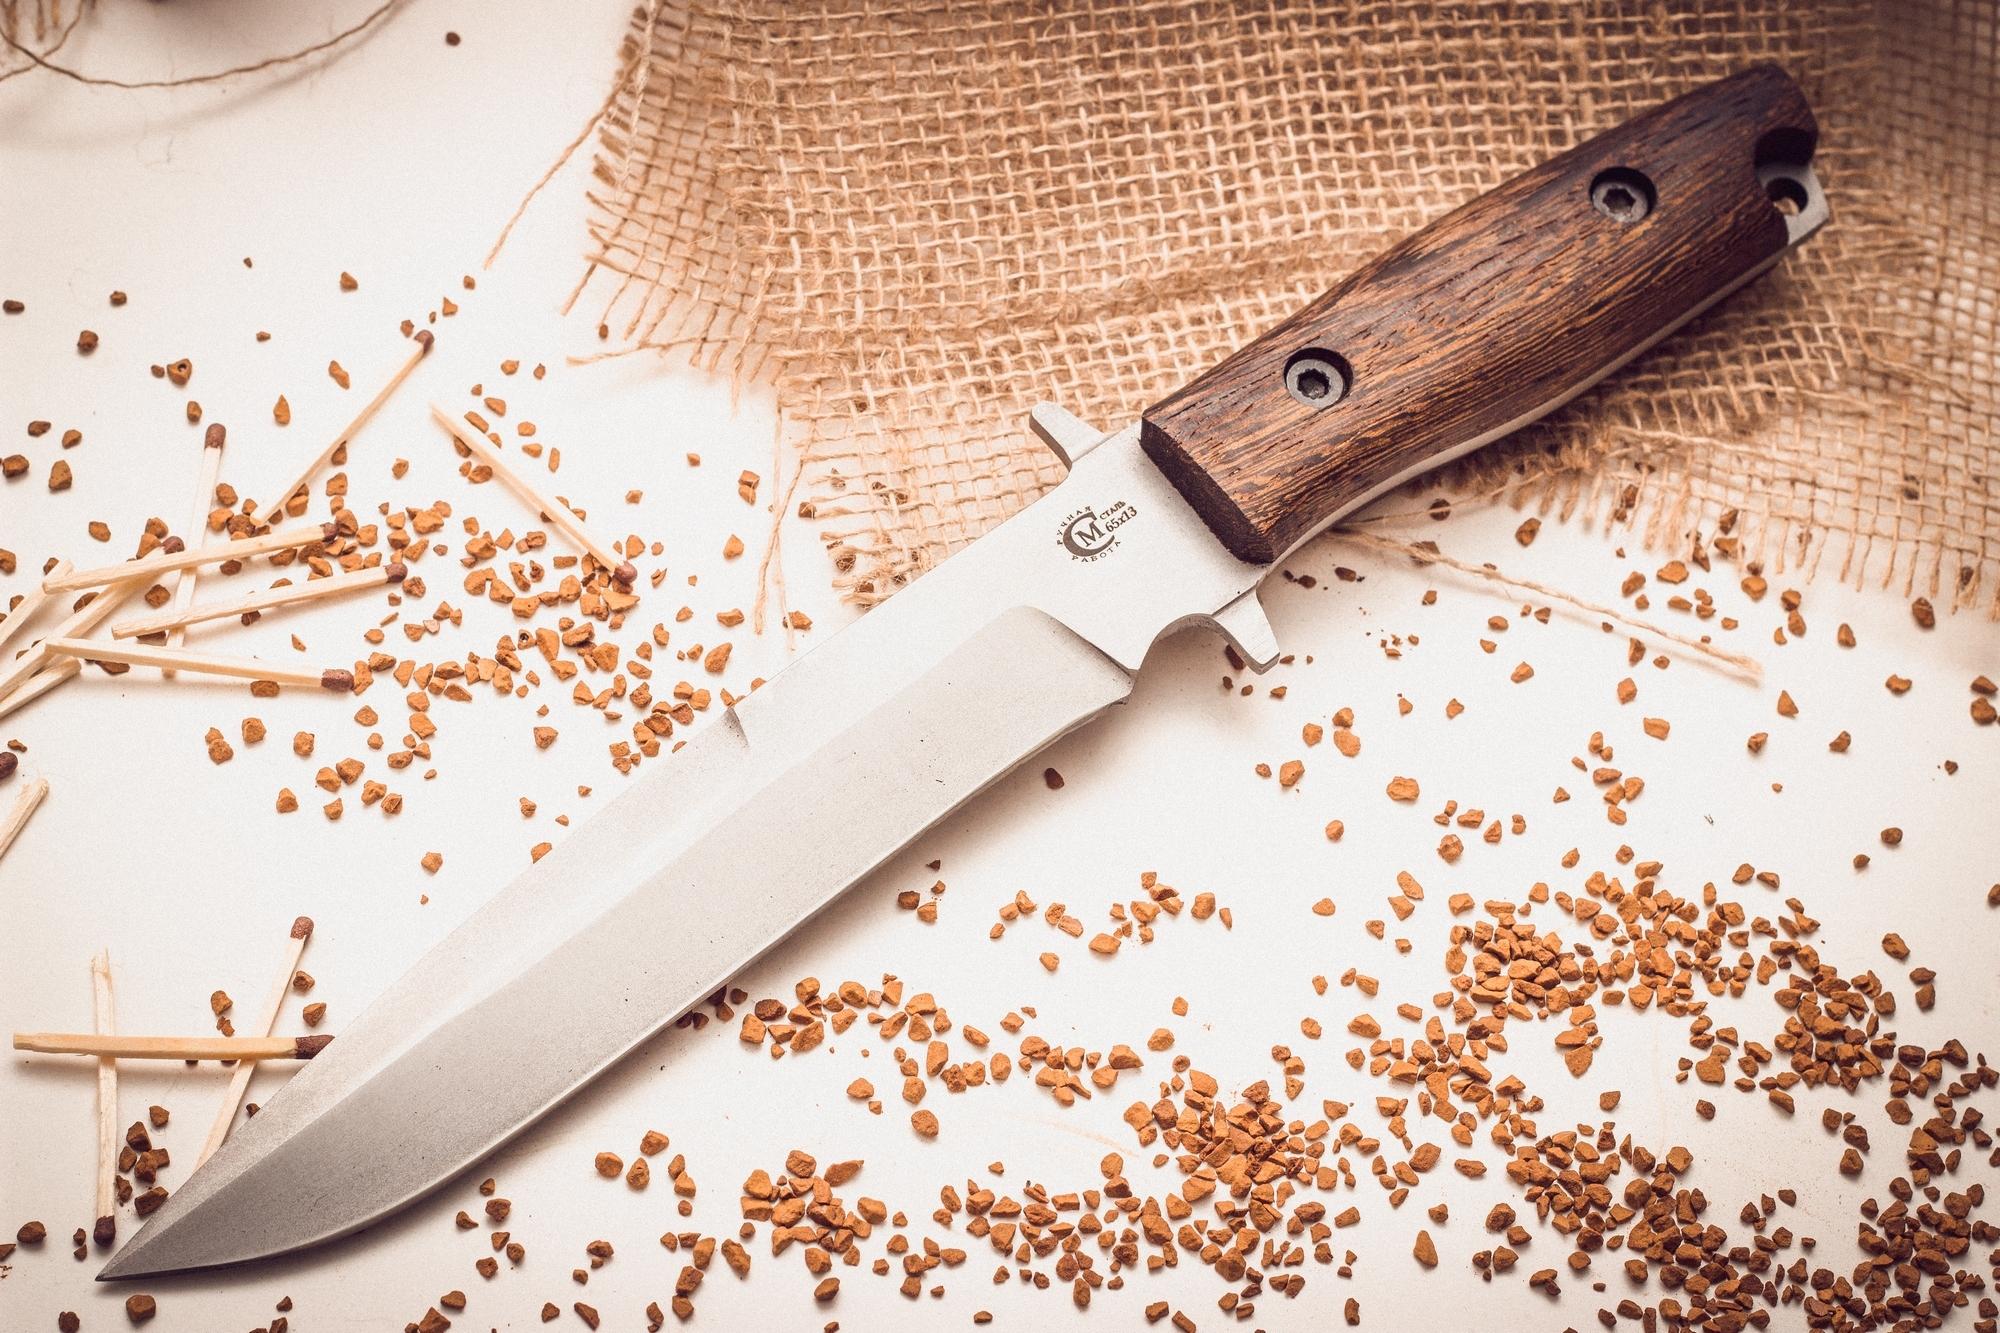 Нож Командор с отверстием для темляка